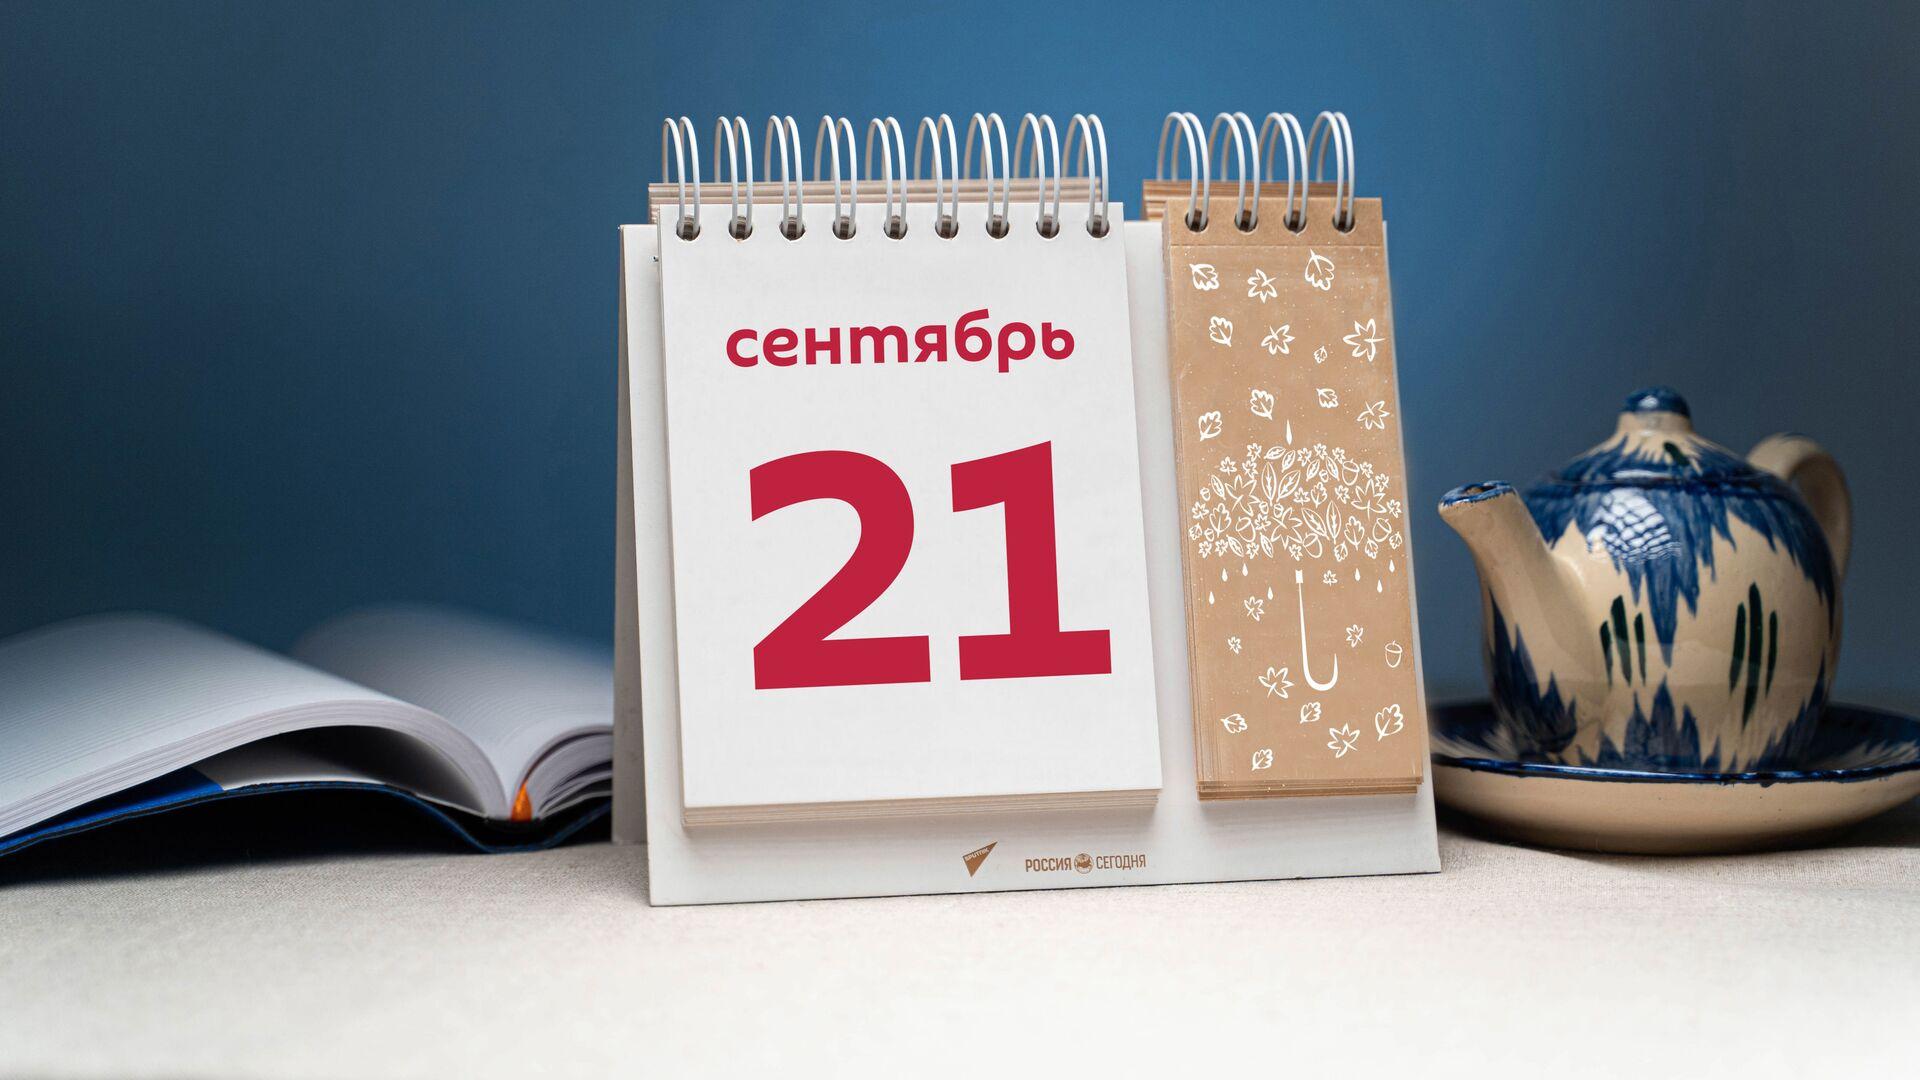 День 21 сентября - Sputnik Тоҷикистон, 1920, 21.09.2021